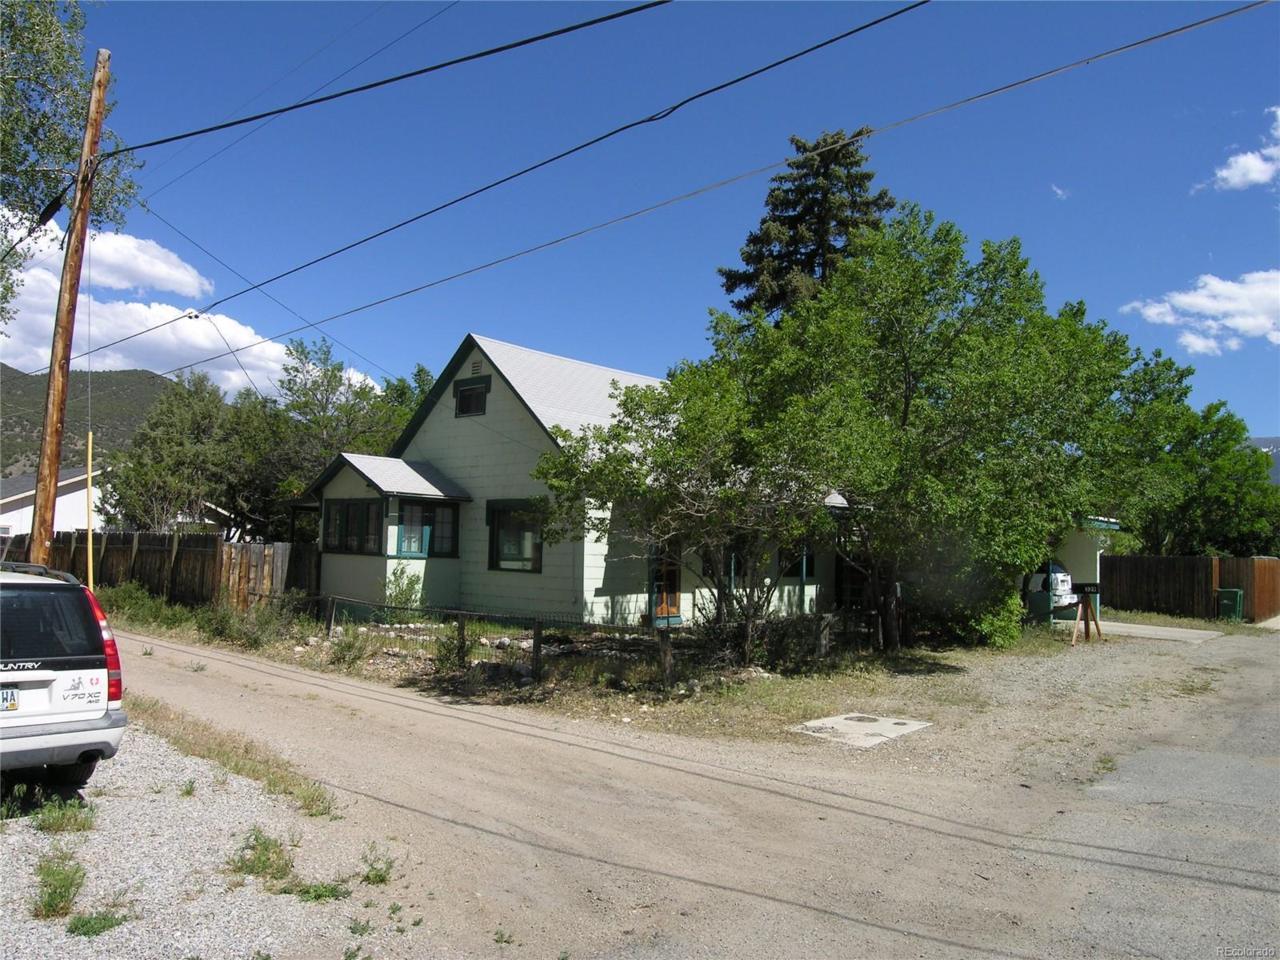 329 Caldwell Avenue, Salida, CO 81201 (MLS #7774942) :: 8z Real Estate